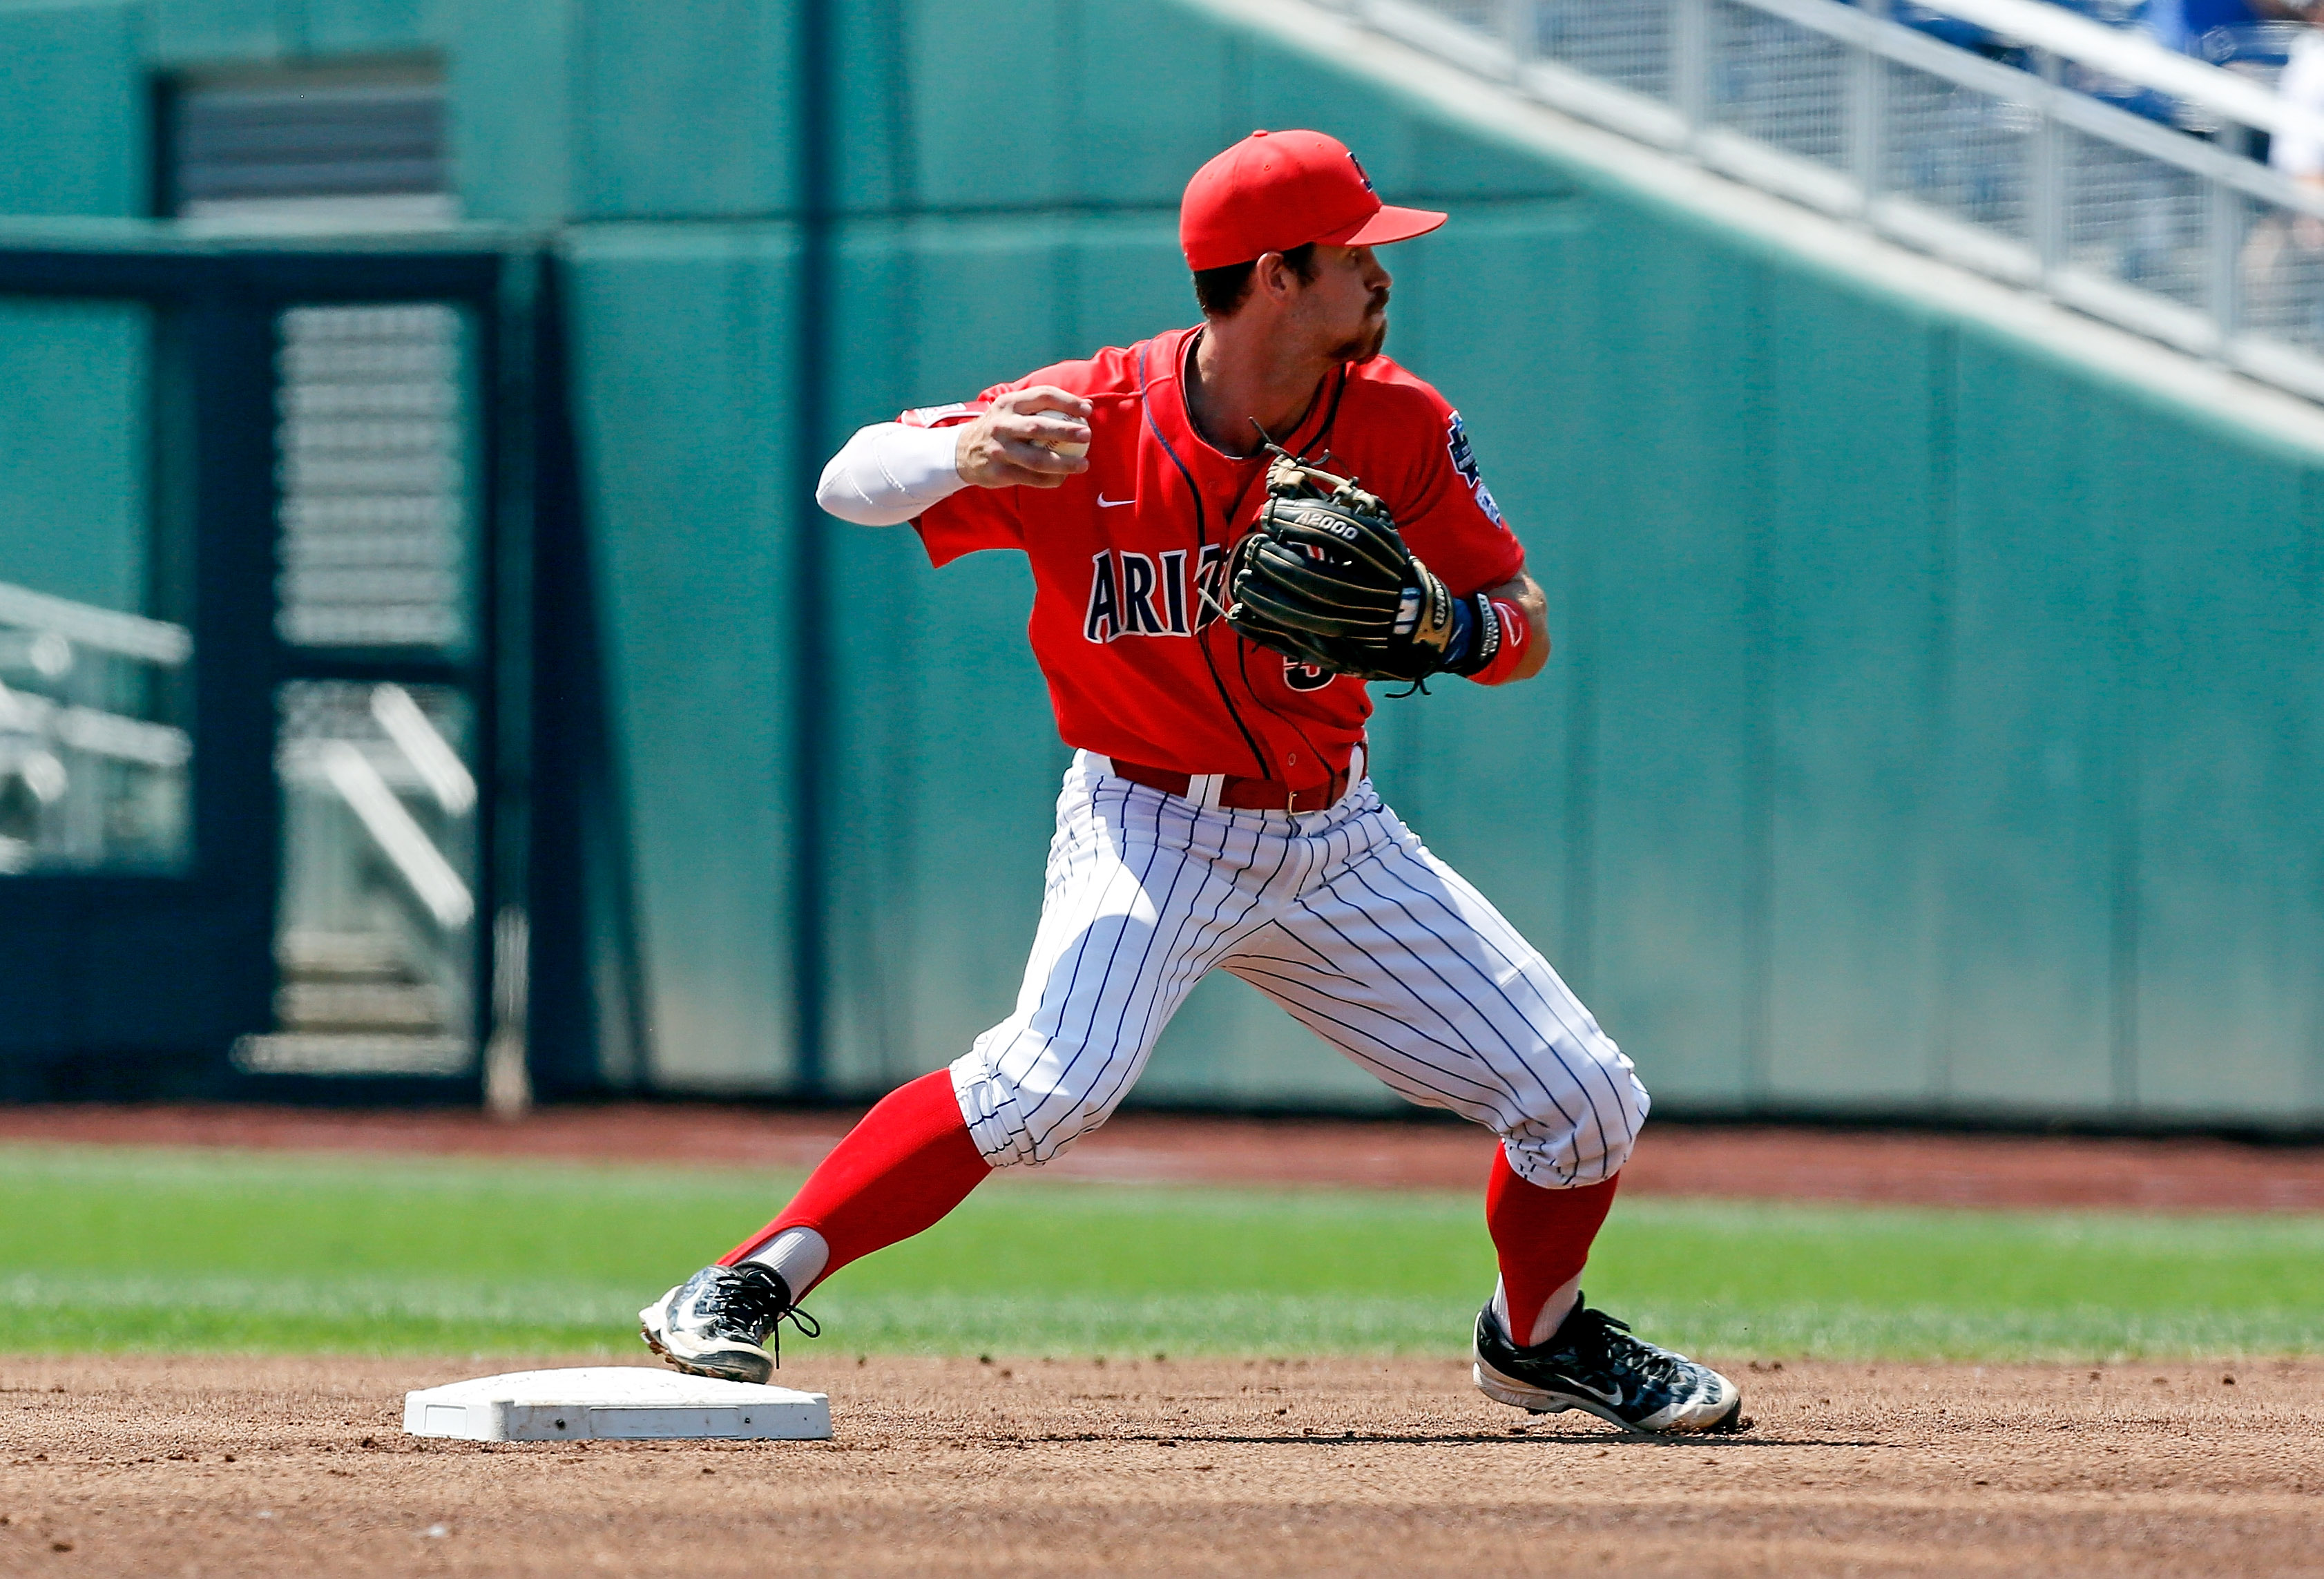 9363330-ncaa-baseball-college-world-series-arizona-vs-coastal-carolina